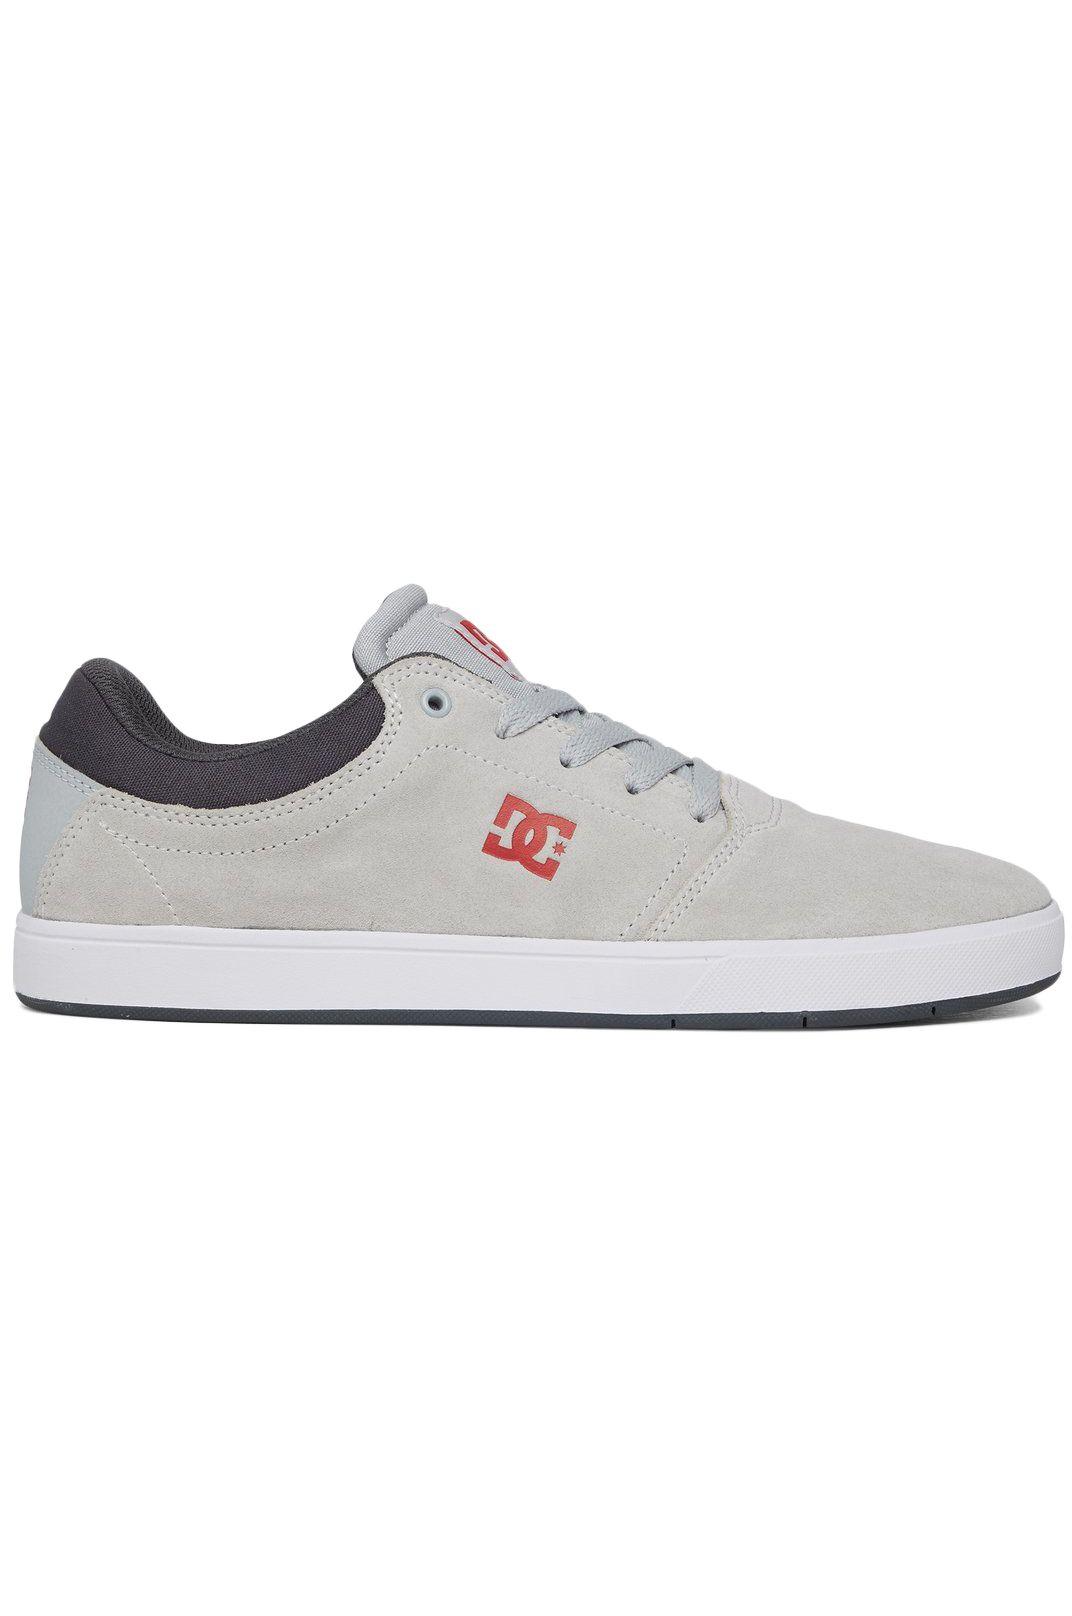 Tenis DC Shoes CRISIS Black/Dk Grey/Athletic Red